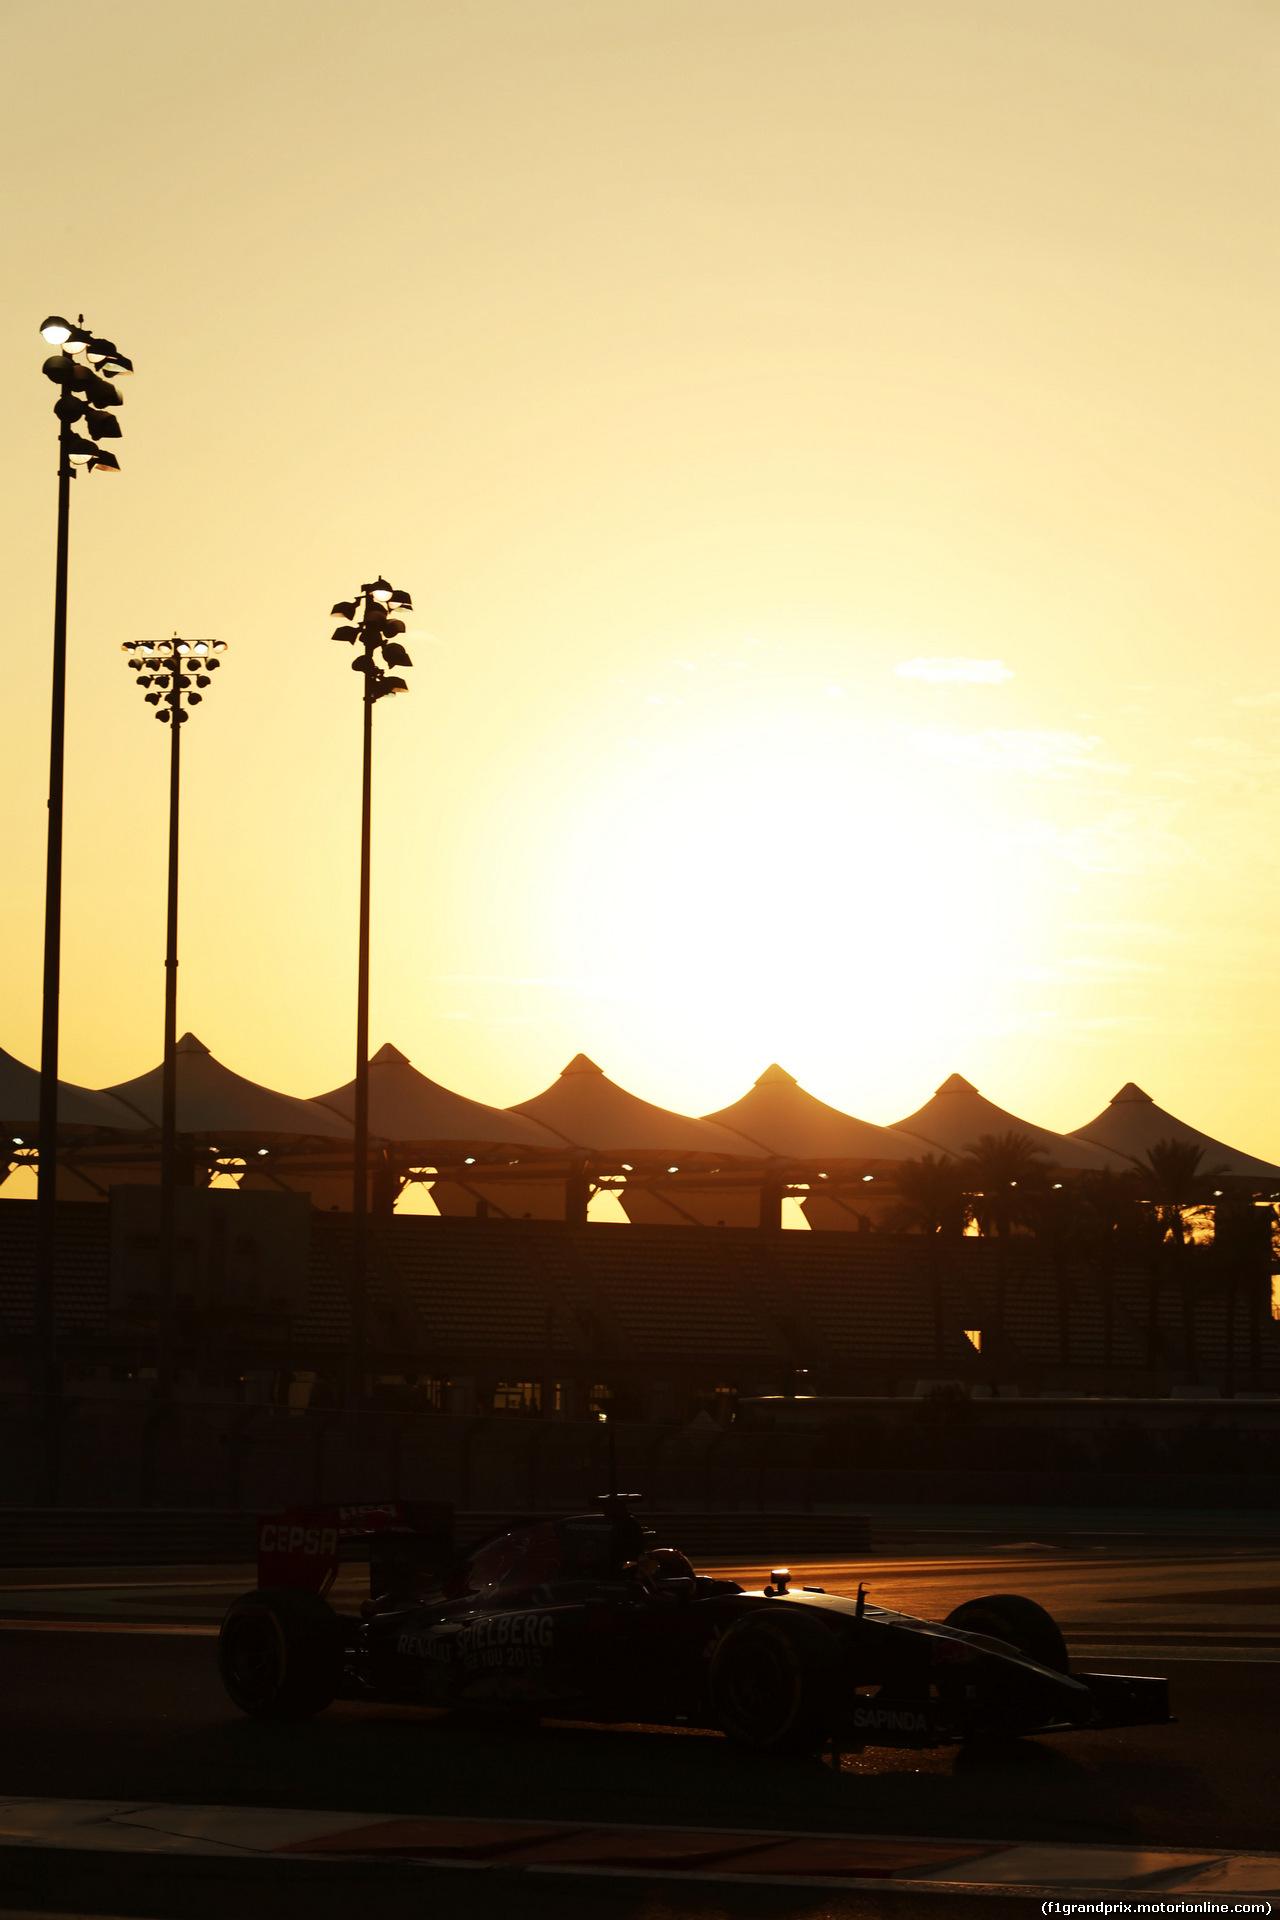 TEST F1 ABU DHABI 25 NOVEMBRE, Max Verstappen (NLD) Scuderia Toro Rosso STR9 Test Driver. 25.11.2014.